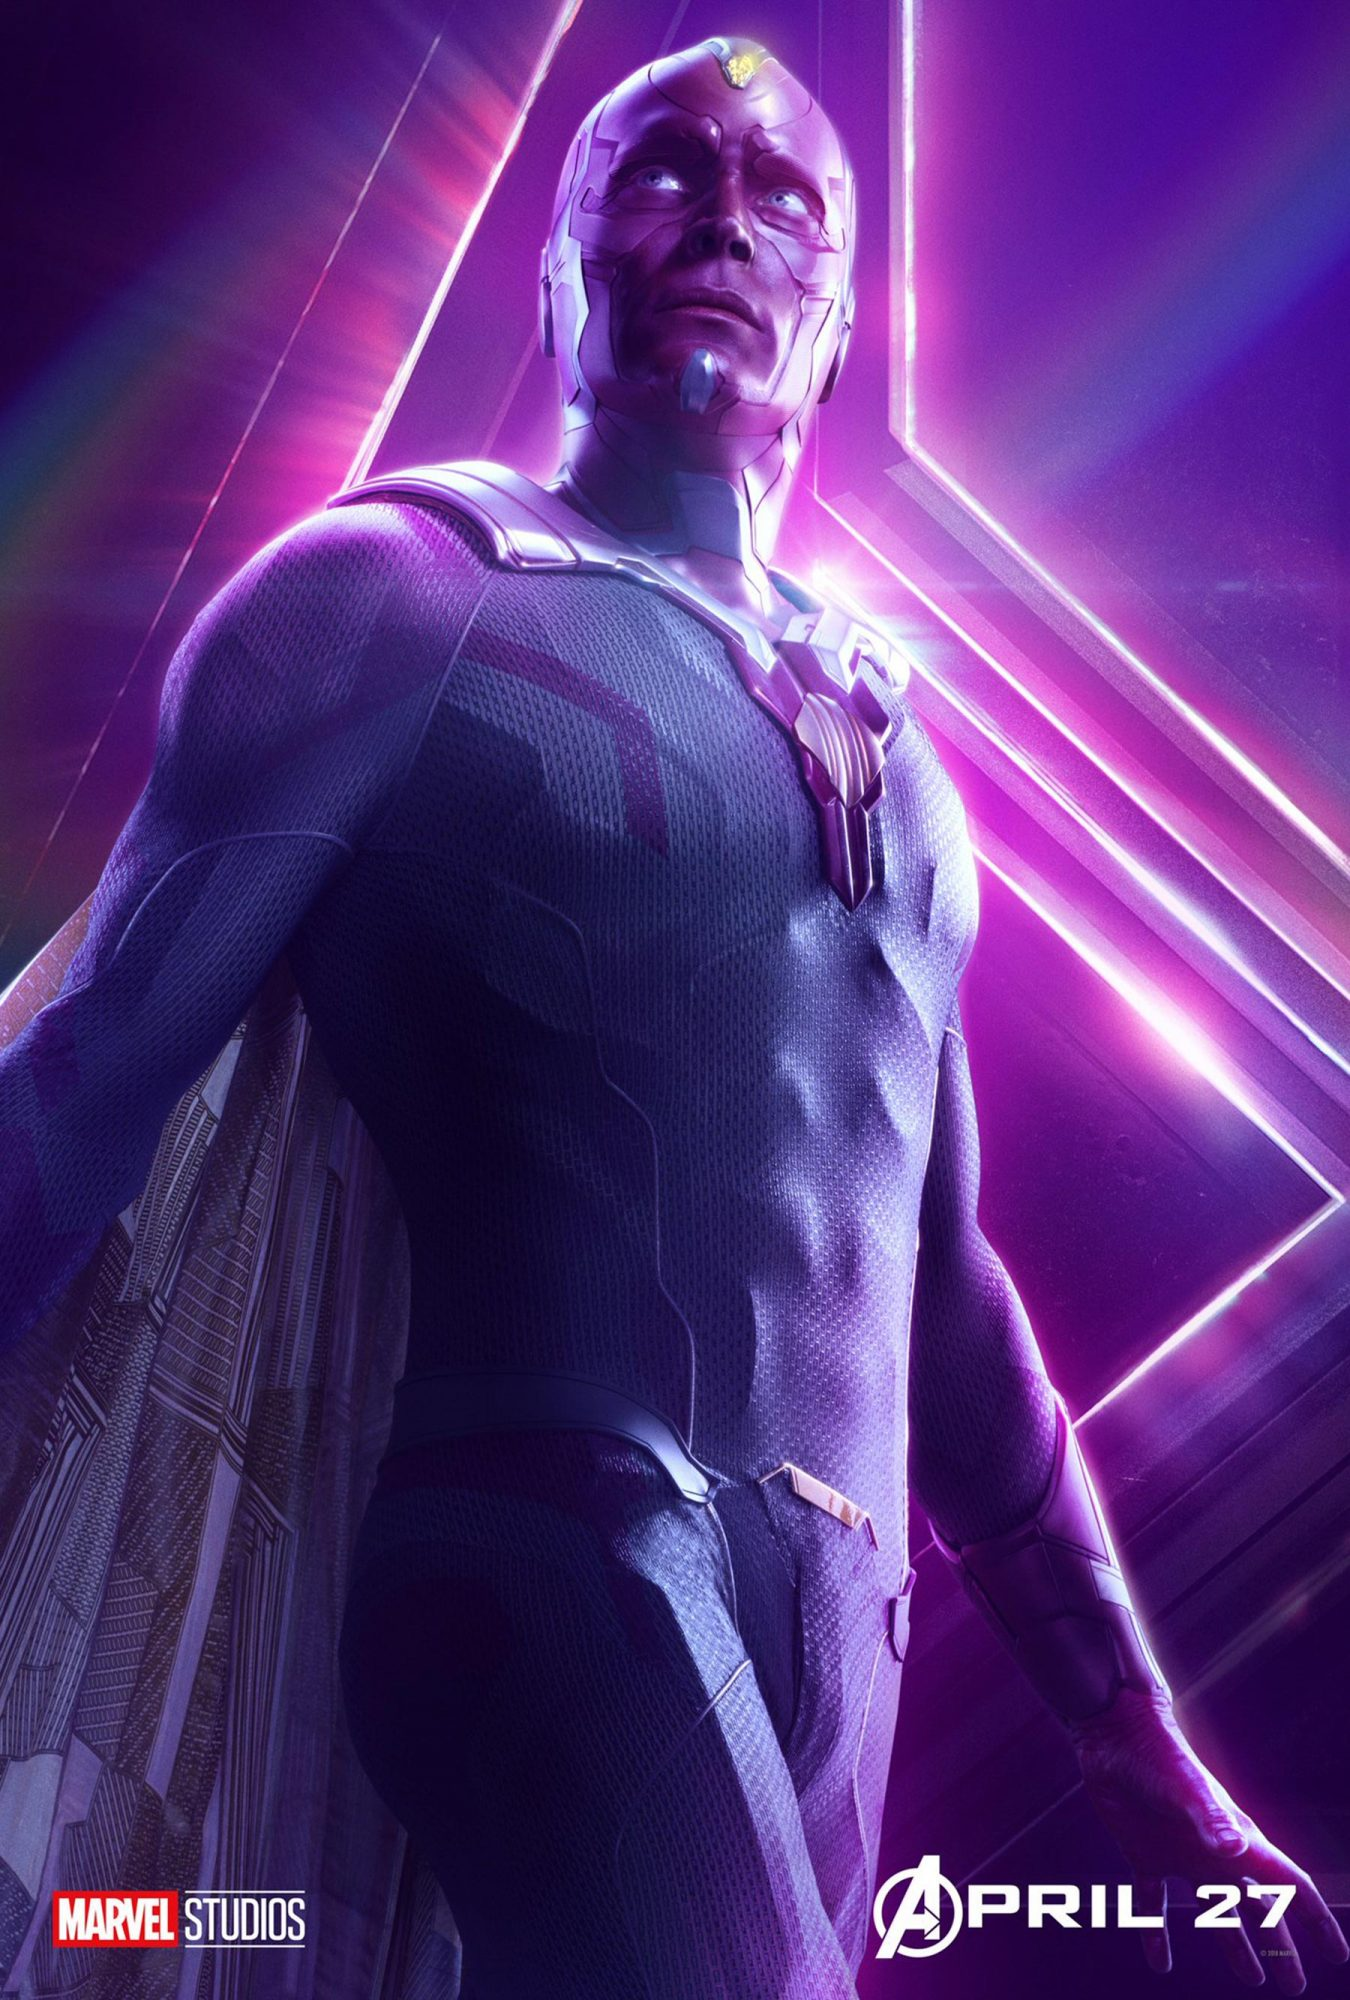 Avengers: Infinity War Character Posters CR: Marvel Studios